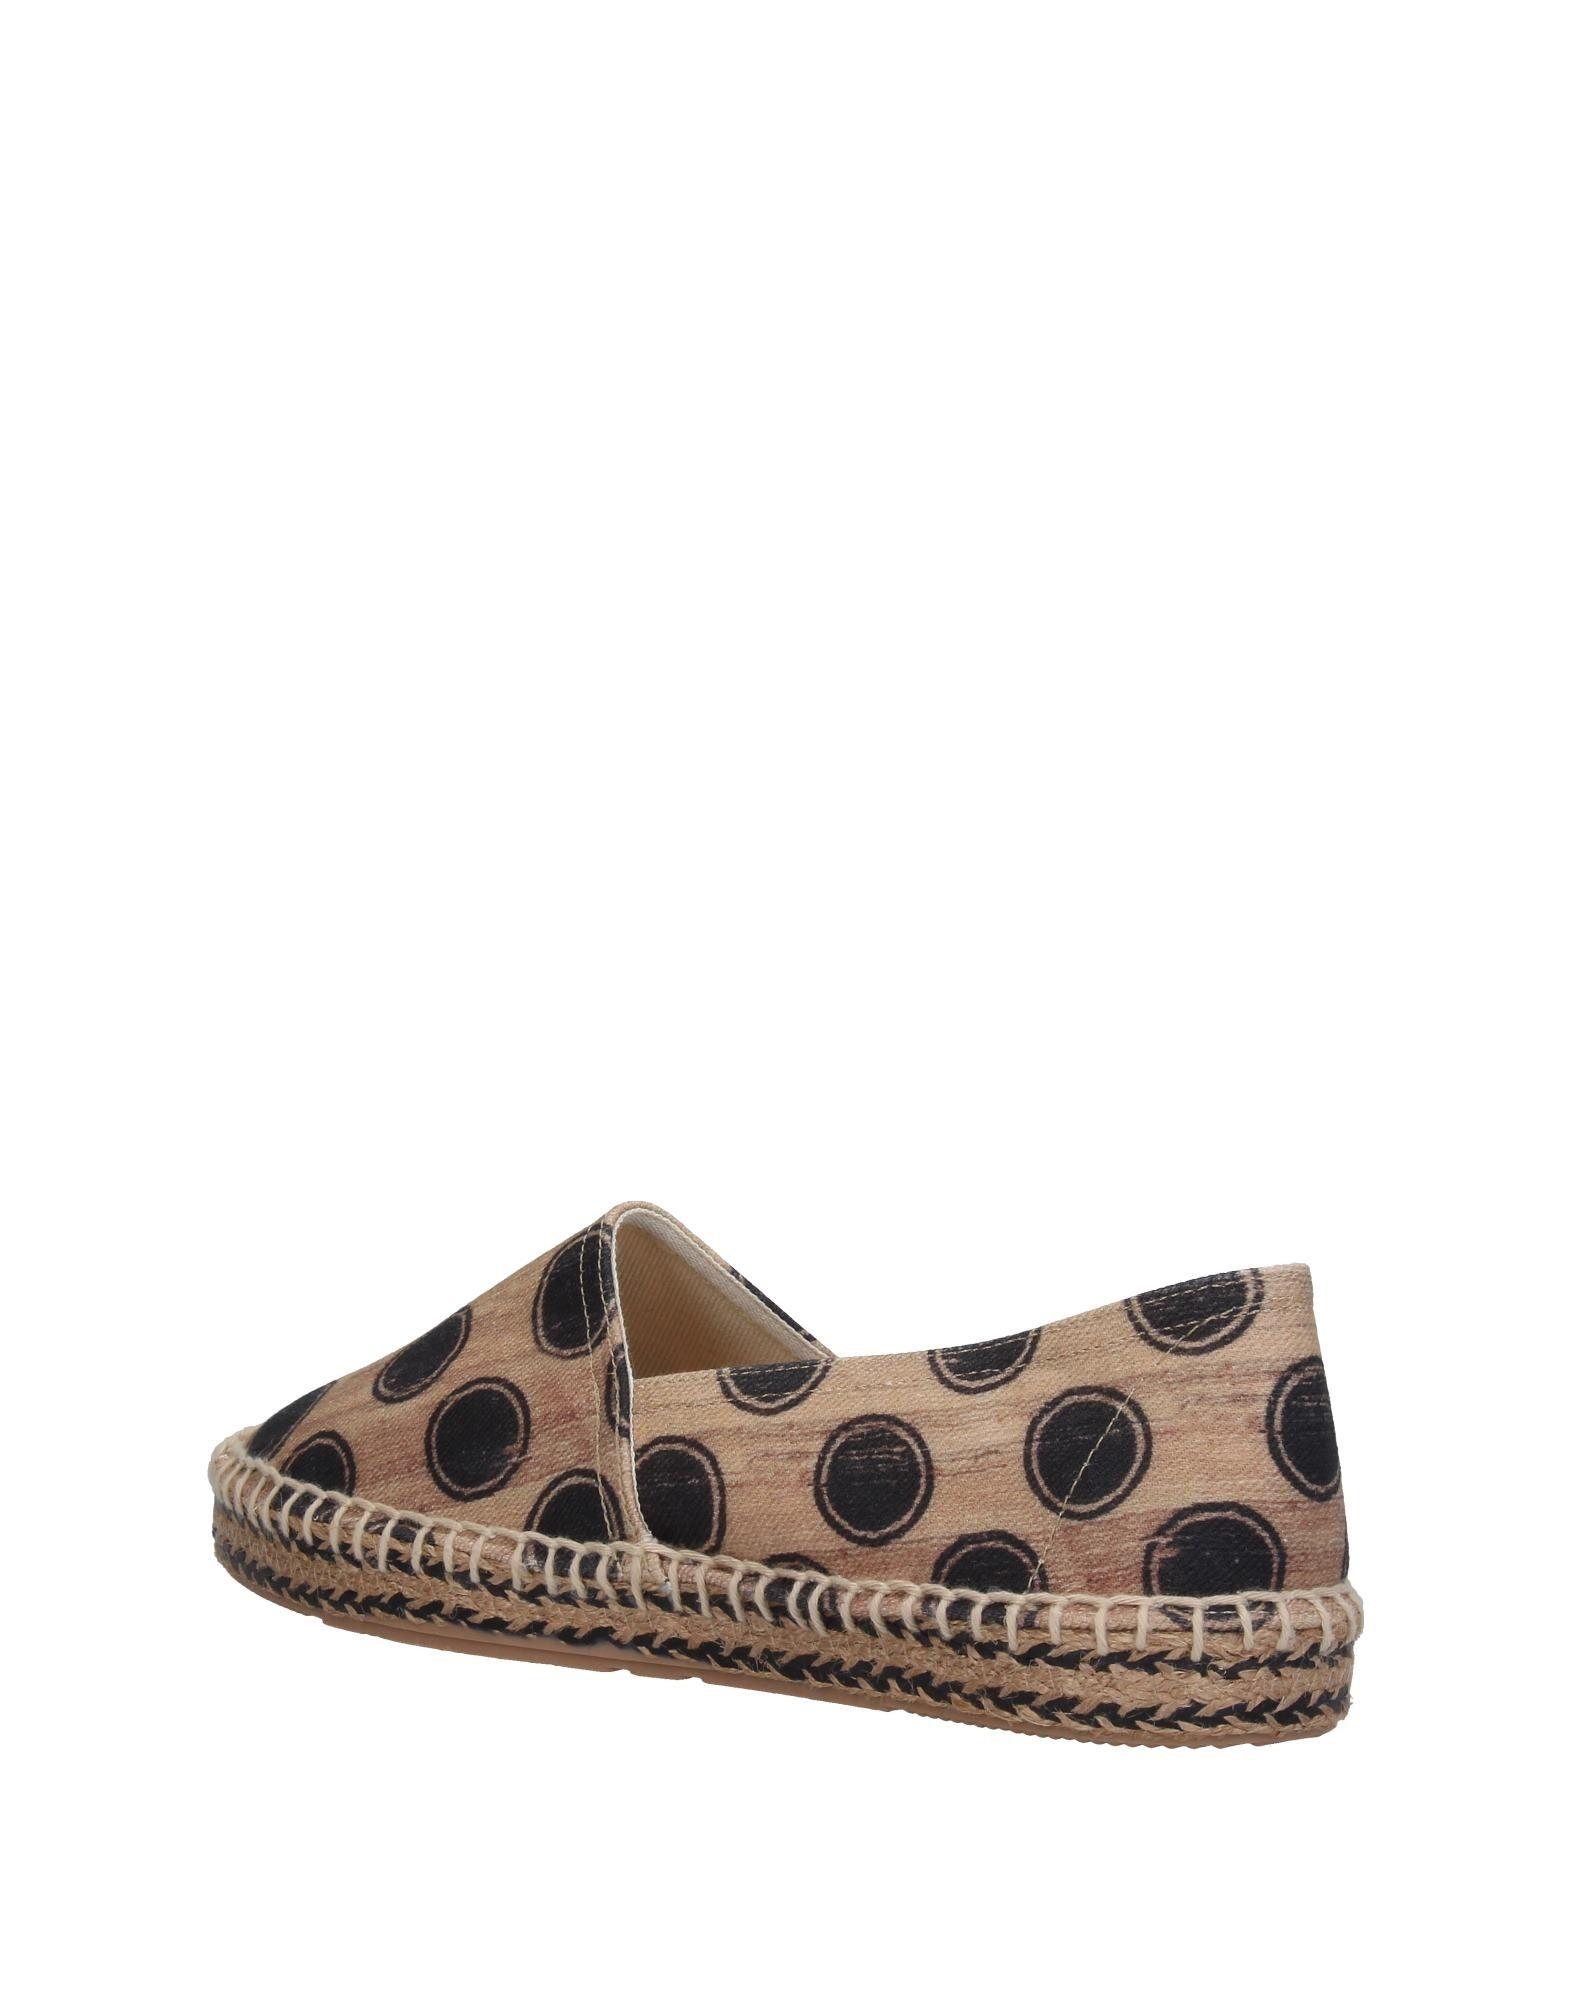 Isabel Marant Étoile Espadrilles Damen  11369490OL Gute Qualität beliebte Schuhe